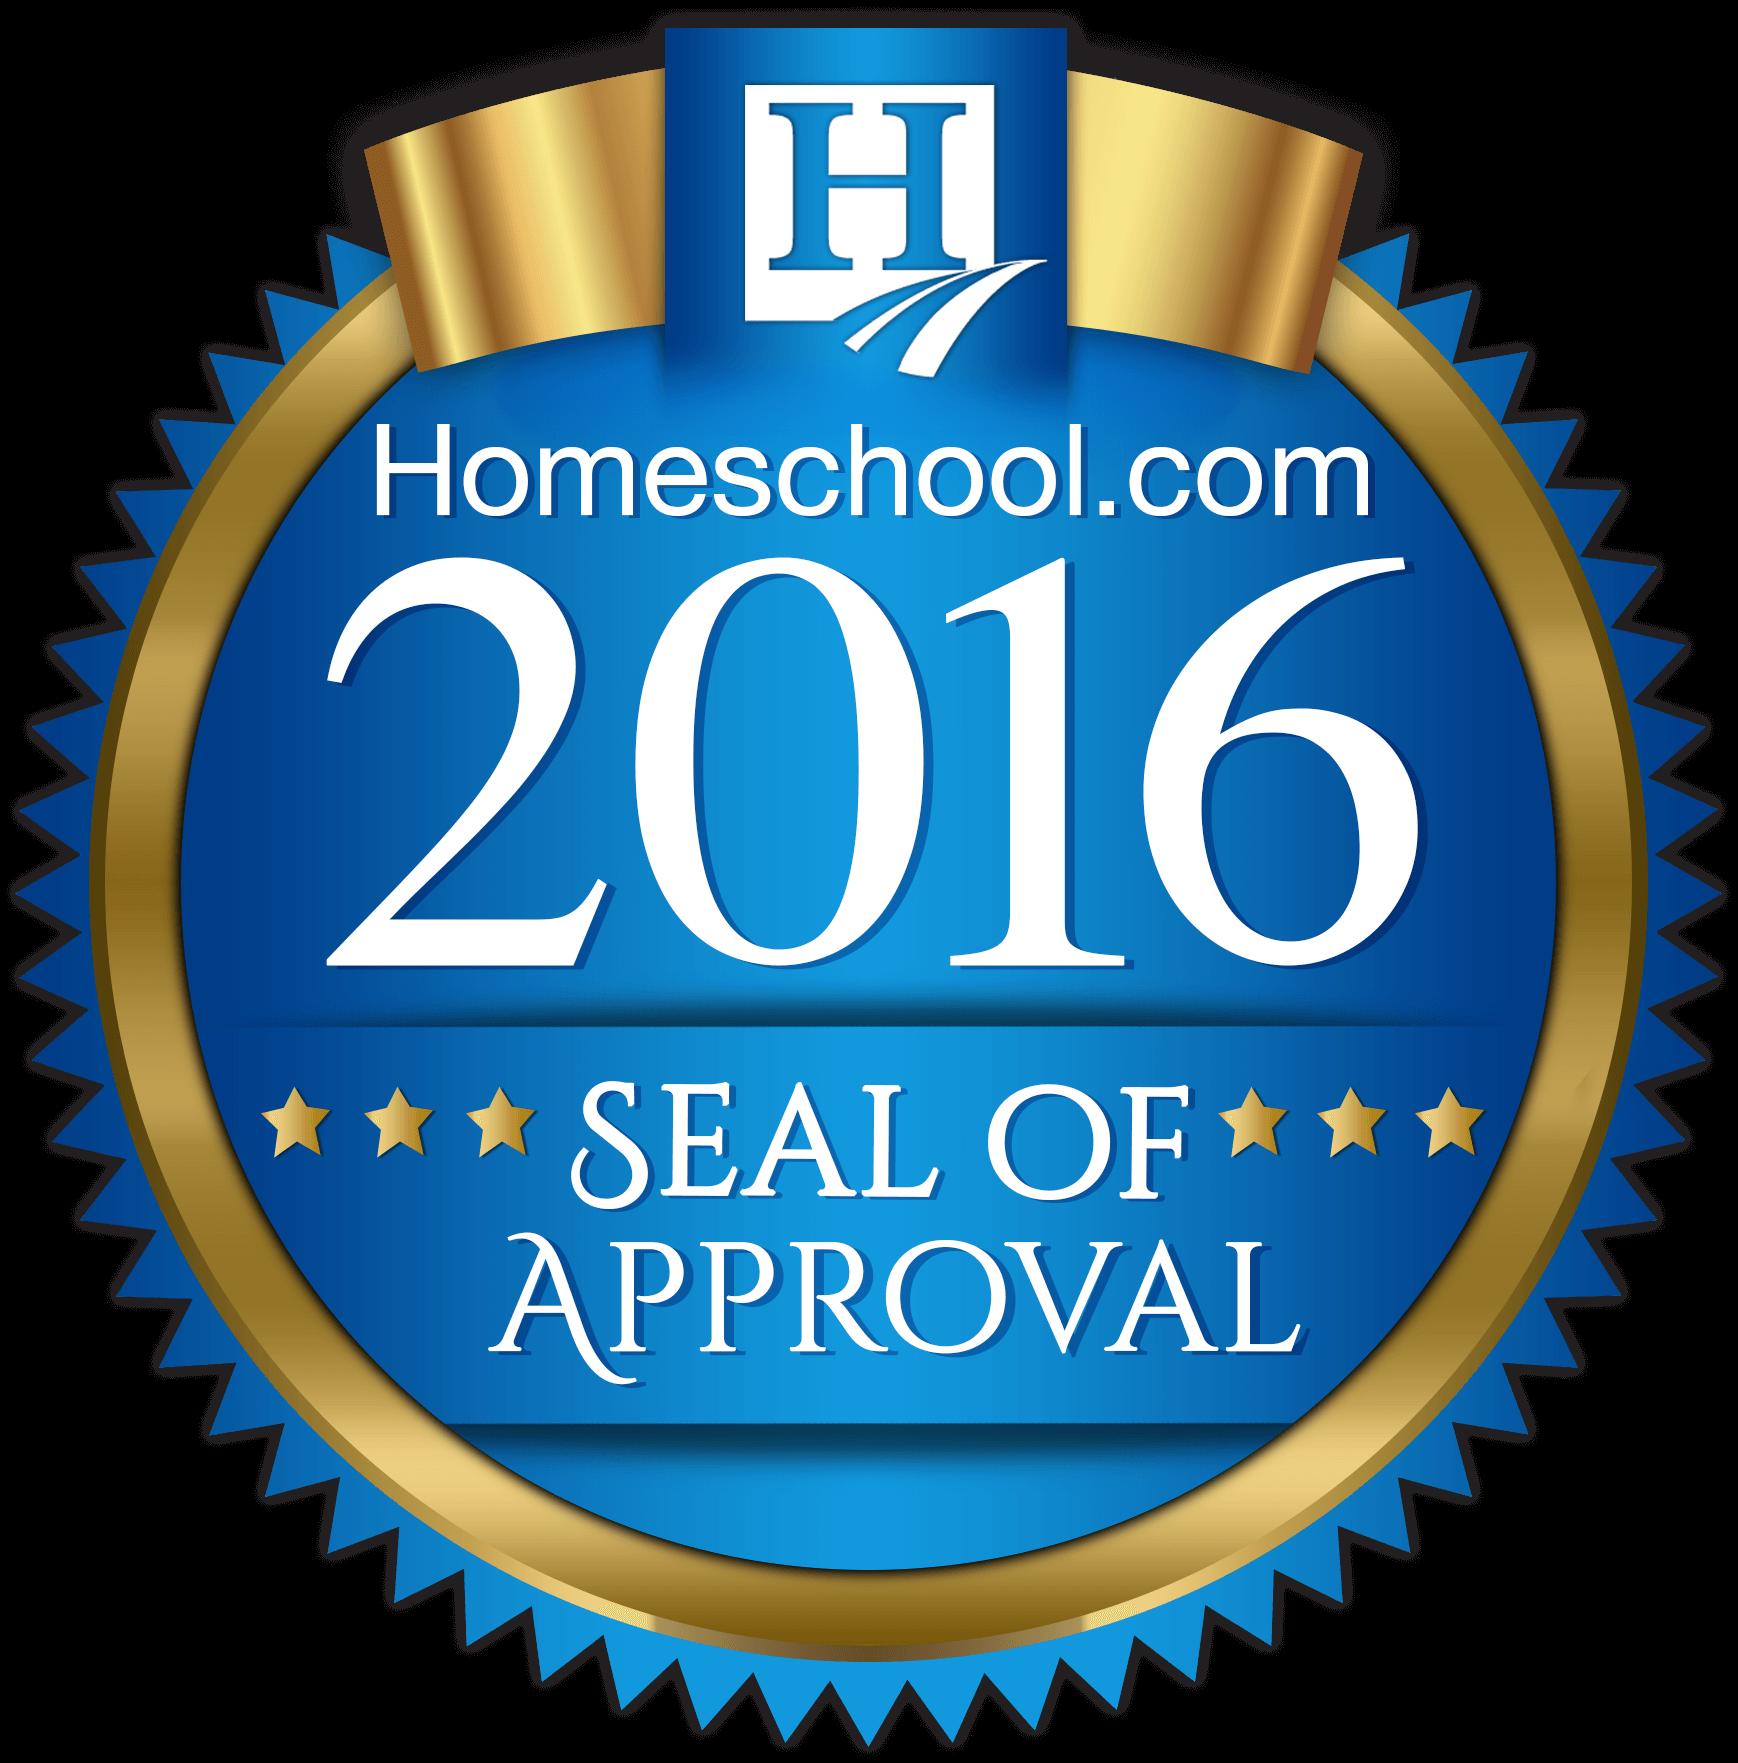 2016-Homeschool-dotcom-Seal-XL